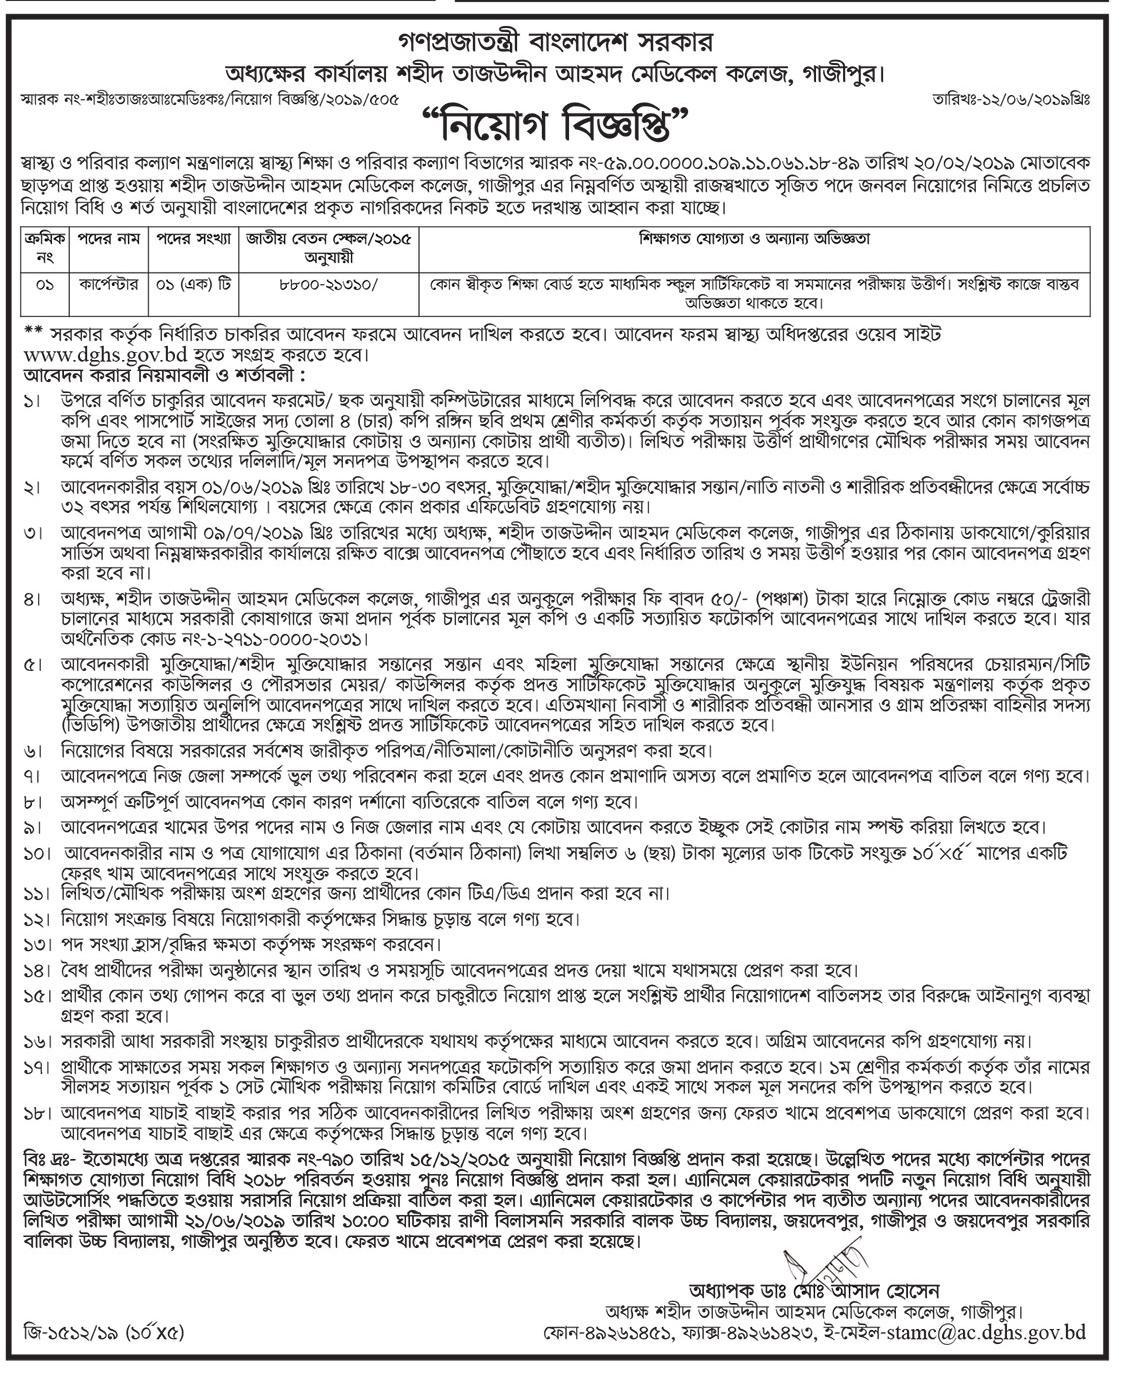 Ministry of Health and Family Welfare Job Circular 2019